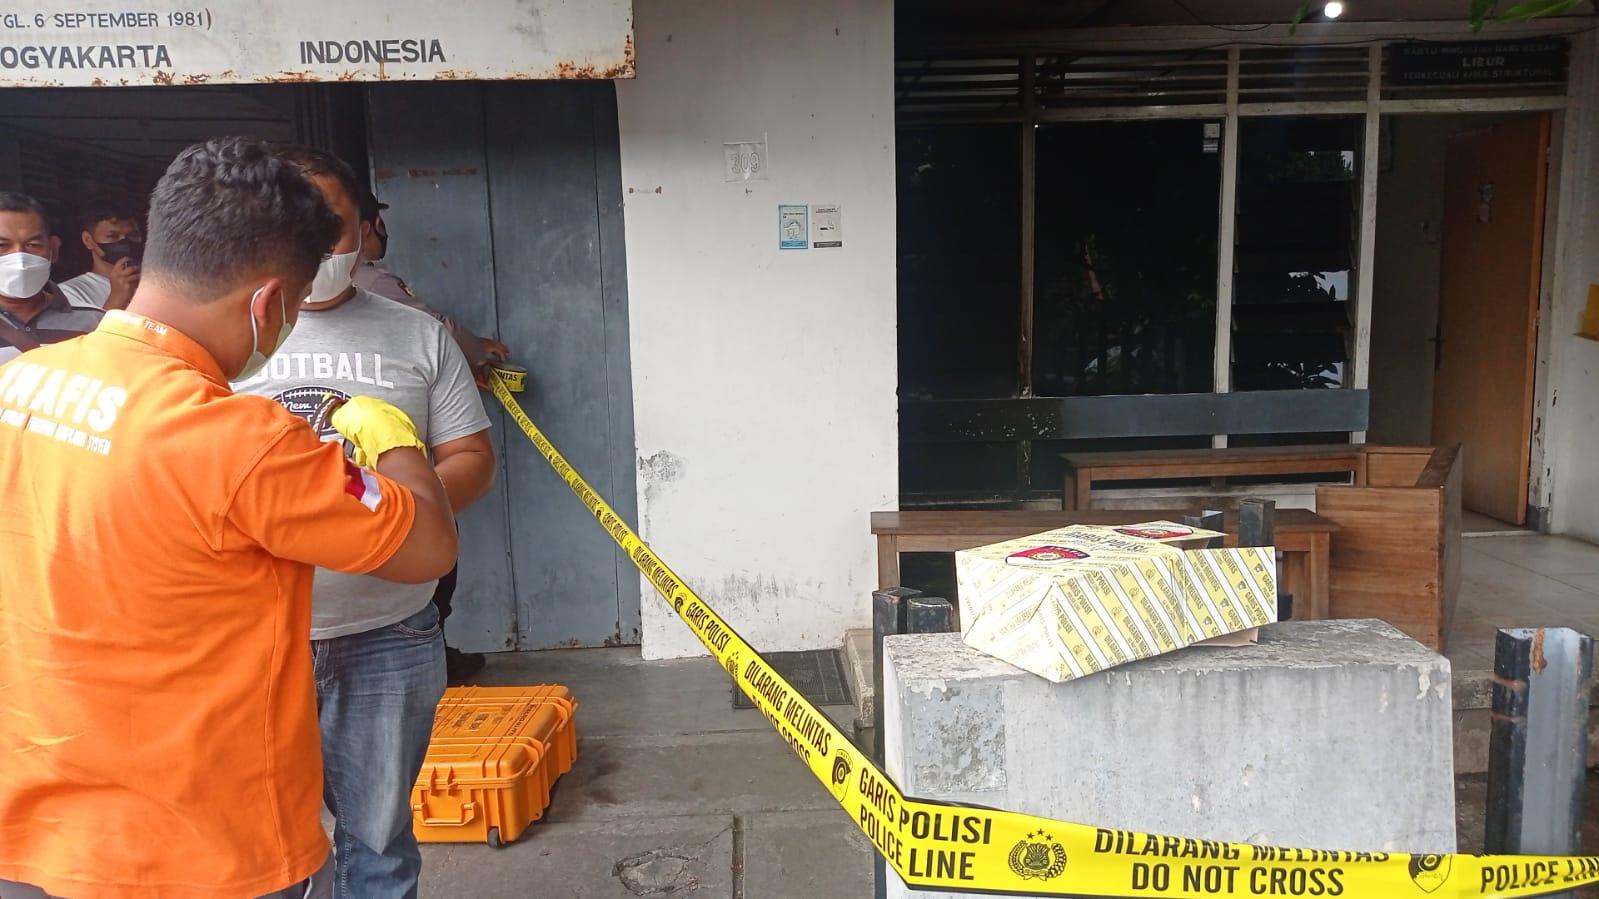 Teror Bom Molotov Diduga Terkait Kasus yang Ditangani LBH Yogyakarta